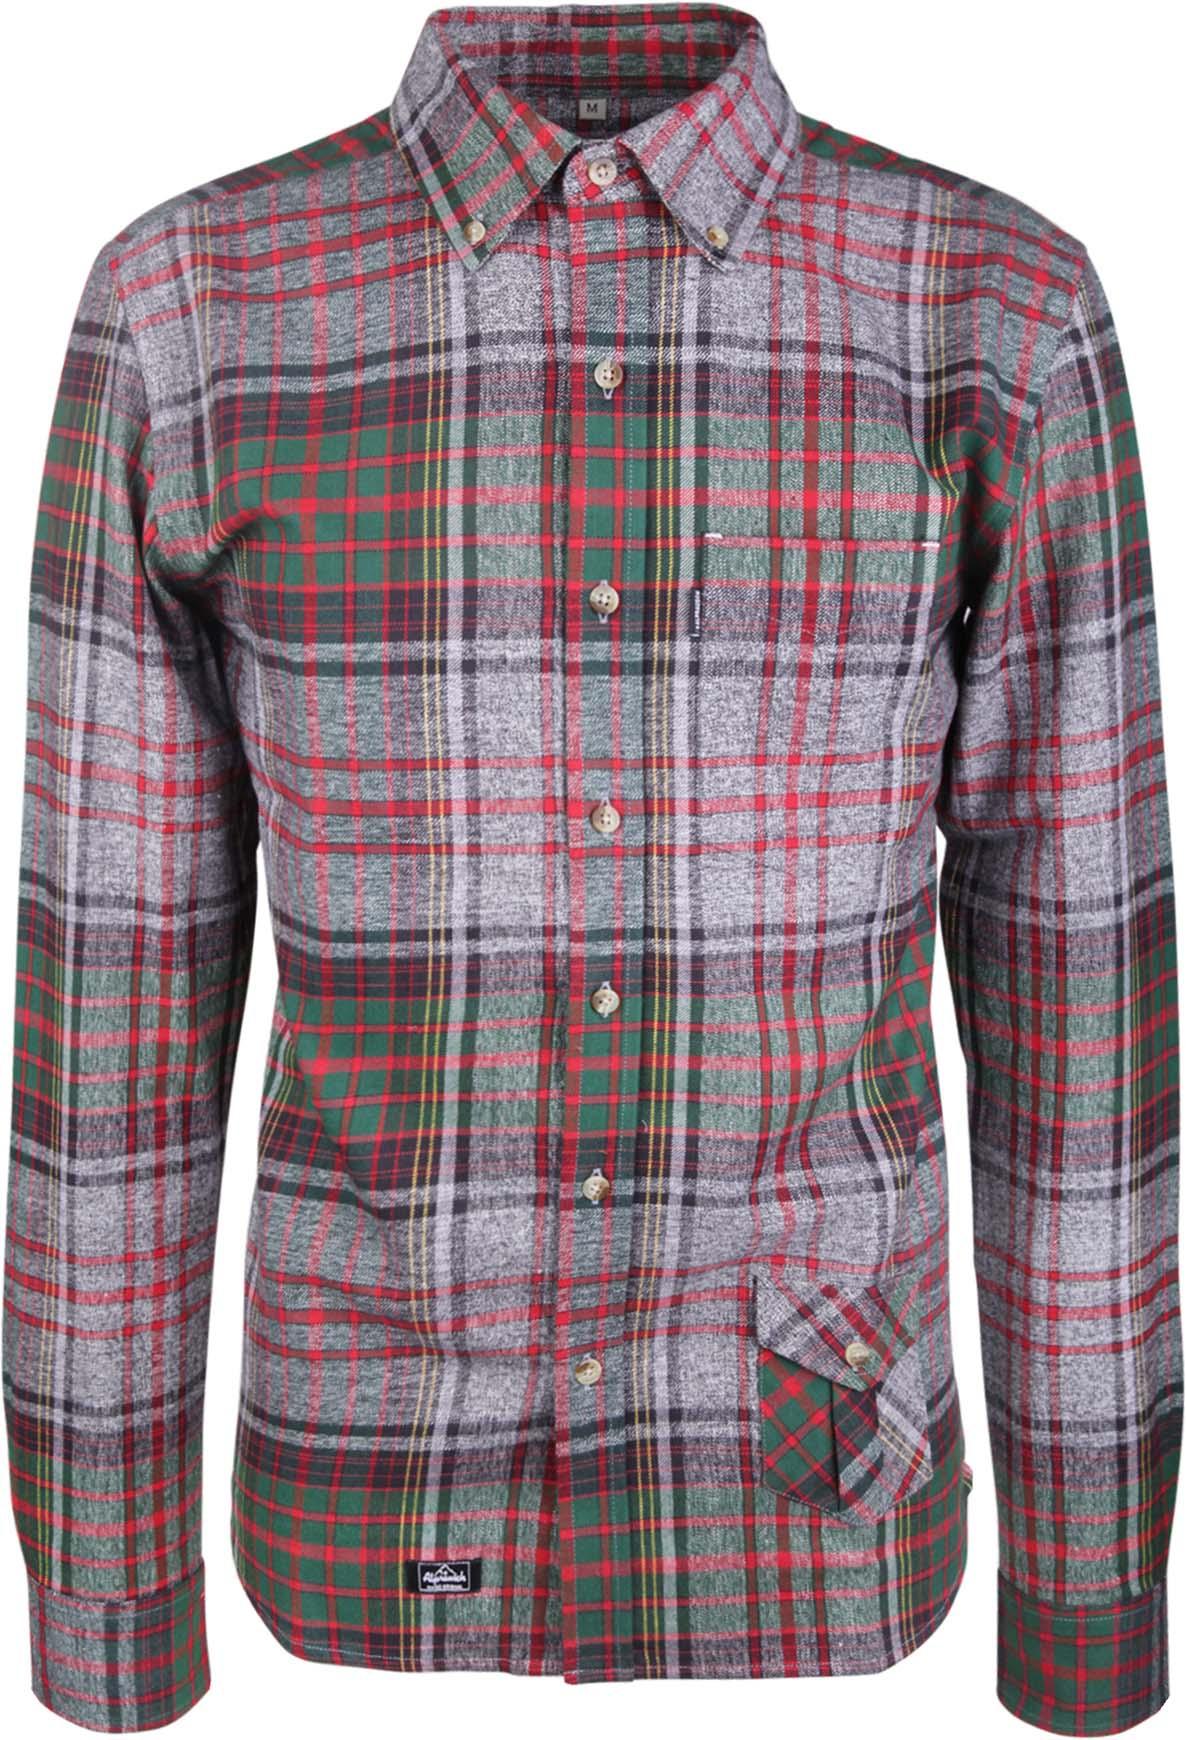 Murer Mage Shirt GreyRedGreen Check